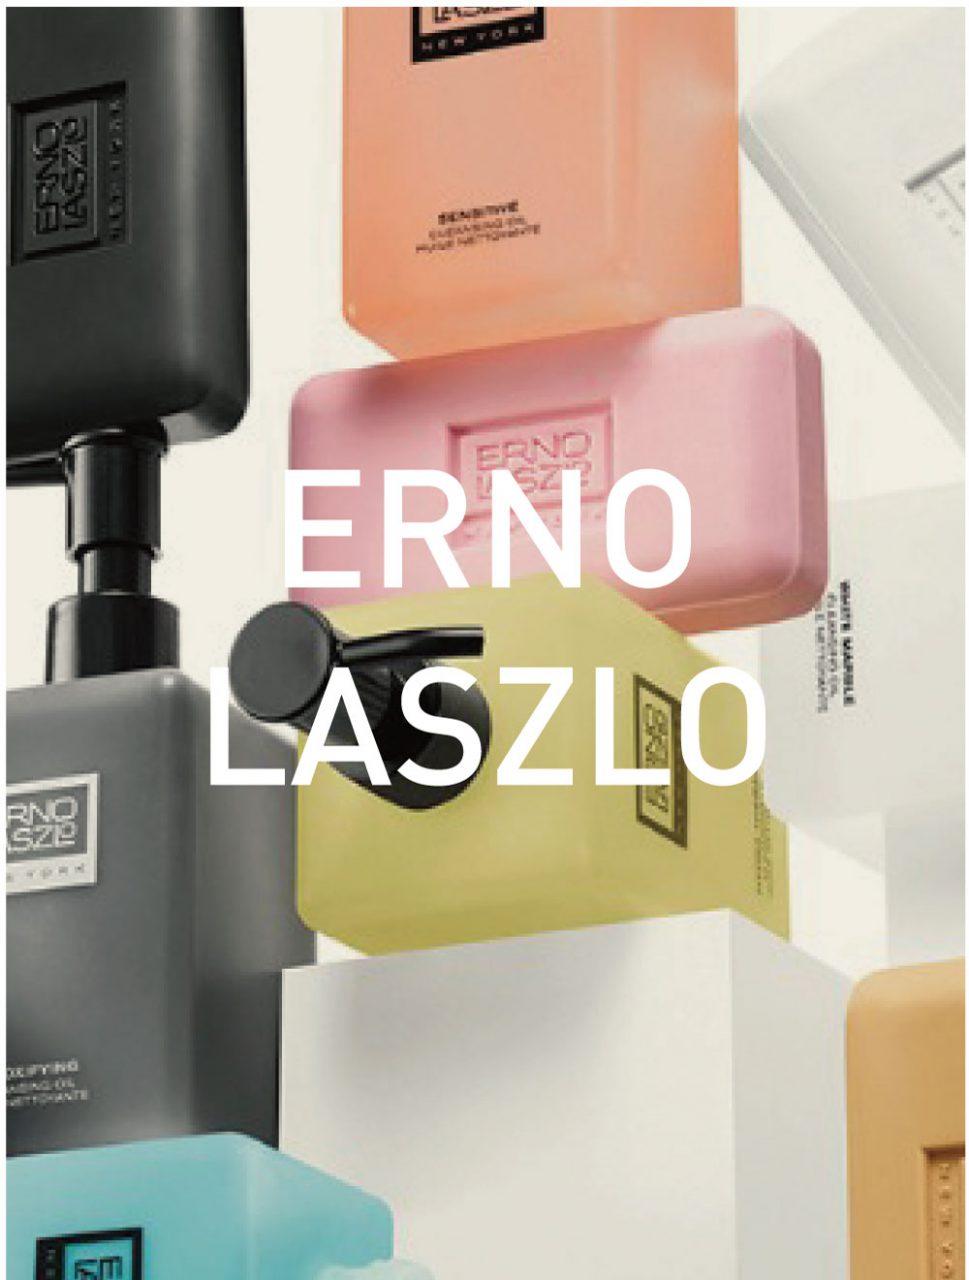 ERNO LASZLO 3-9<br/>再生滋潤嫩膚護理